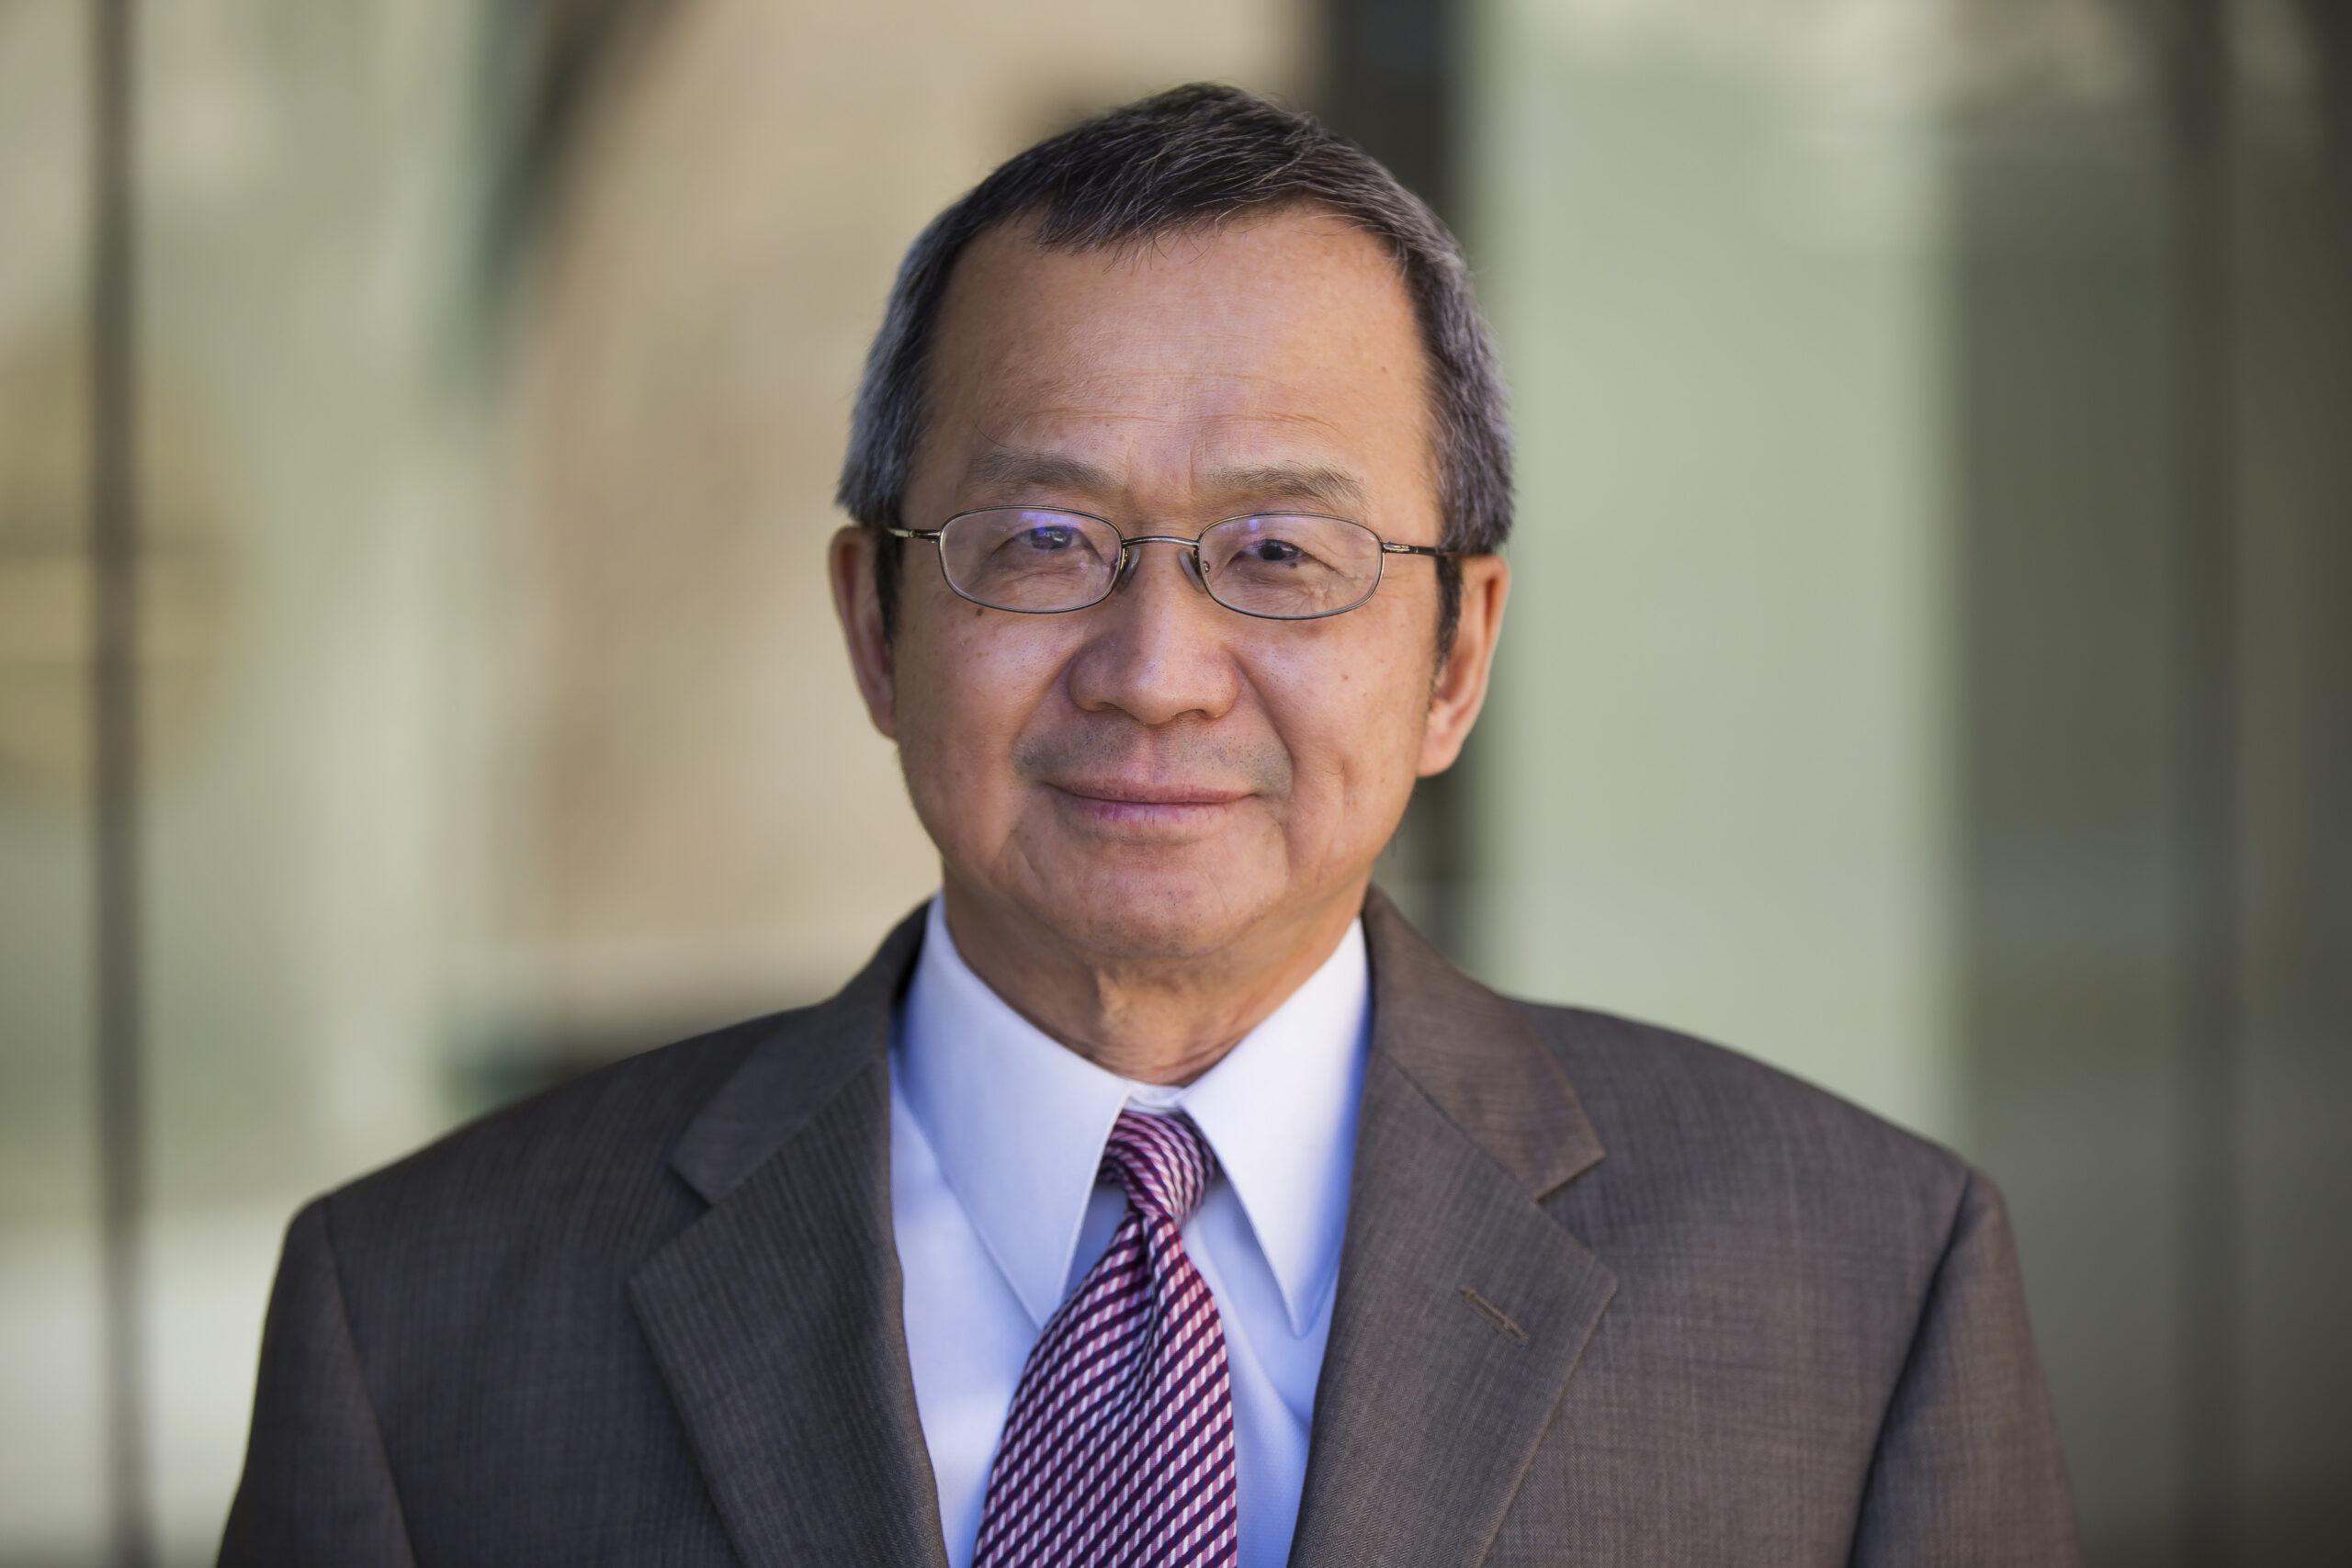 Leung Tsangr. Image credit: Joseph Xu, Michigan Engineering